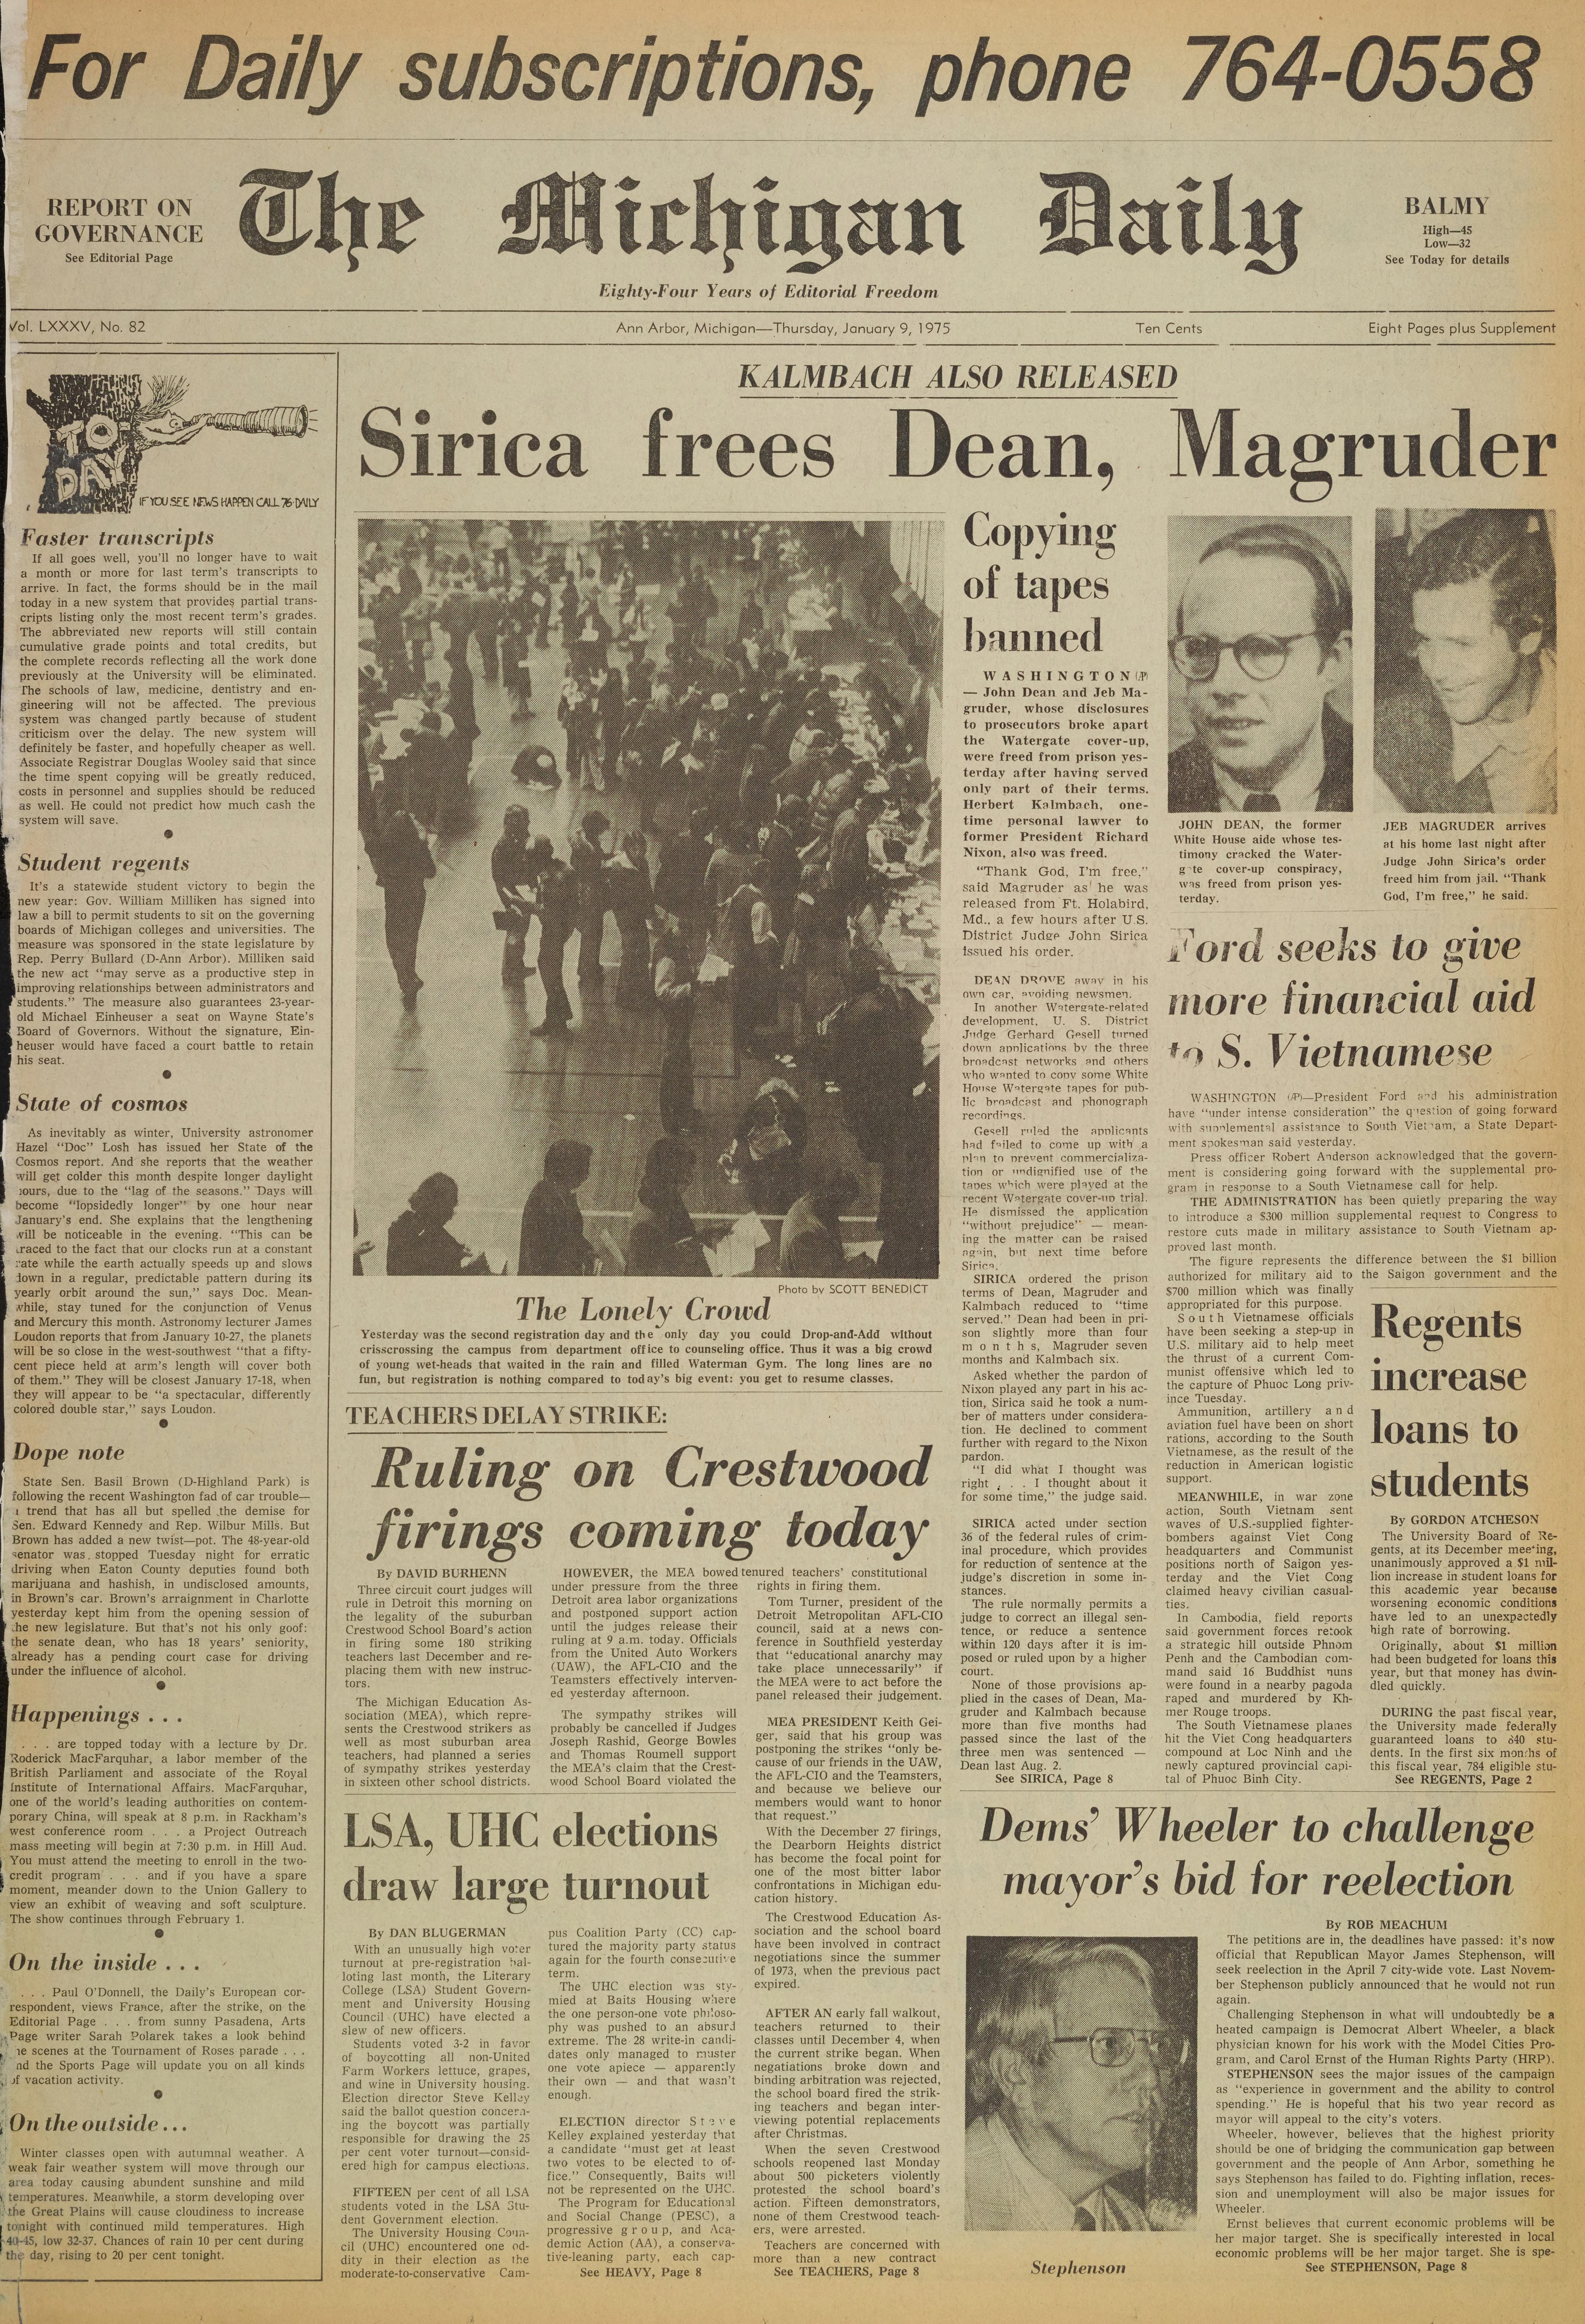 Michigan Daily Digital Archives - January 09, 1975 (vol  85